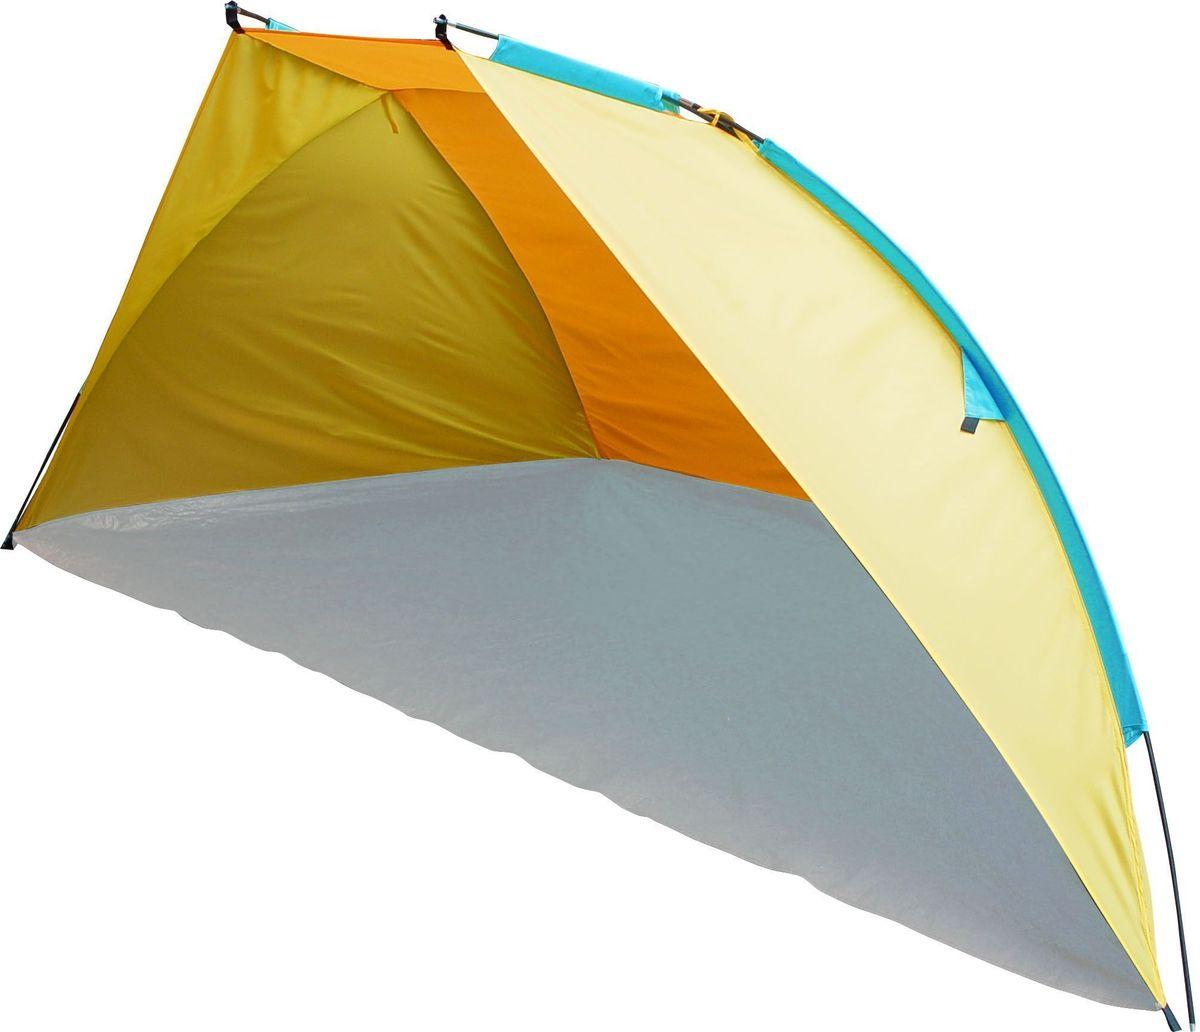 Тент пляжный GoGarden  Tenerife Beach , цвет: желтый, оранжевый, 270 х 120 х 120 см - Палатки и тенты